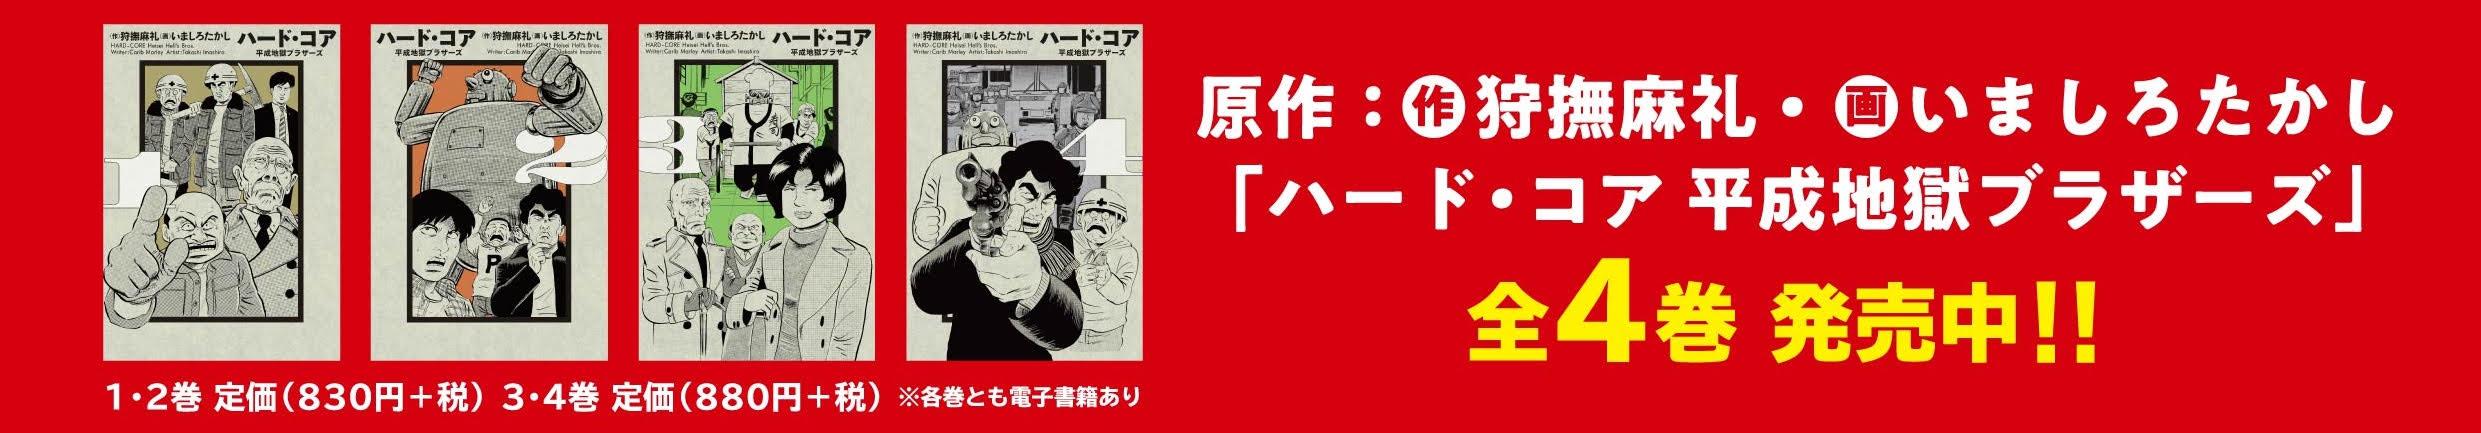 hc_gensaku_01